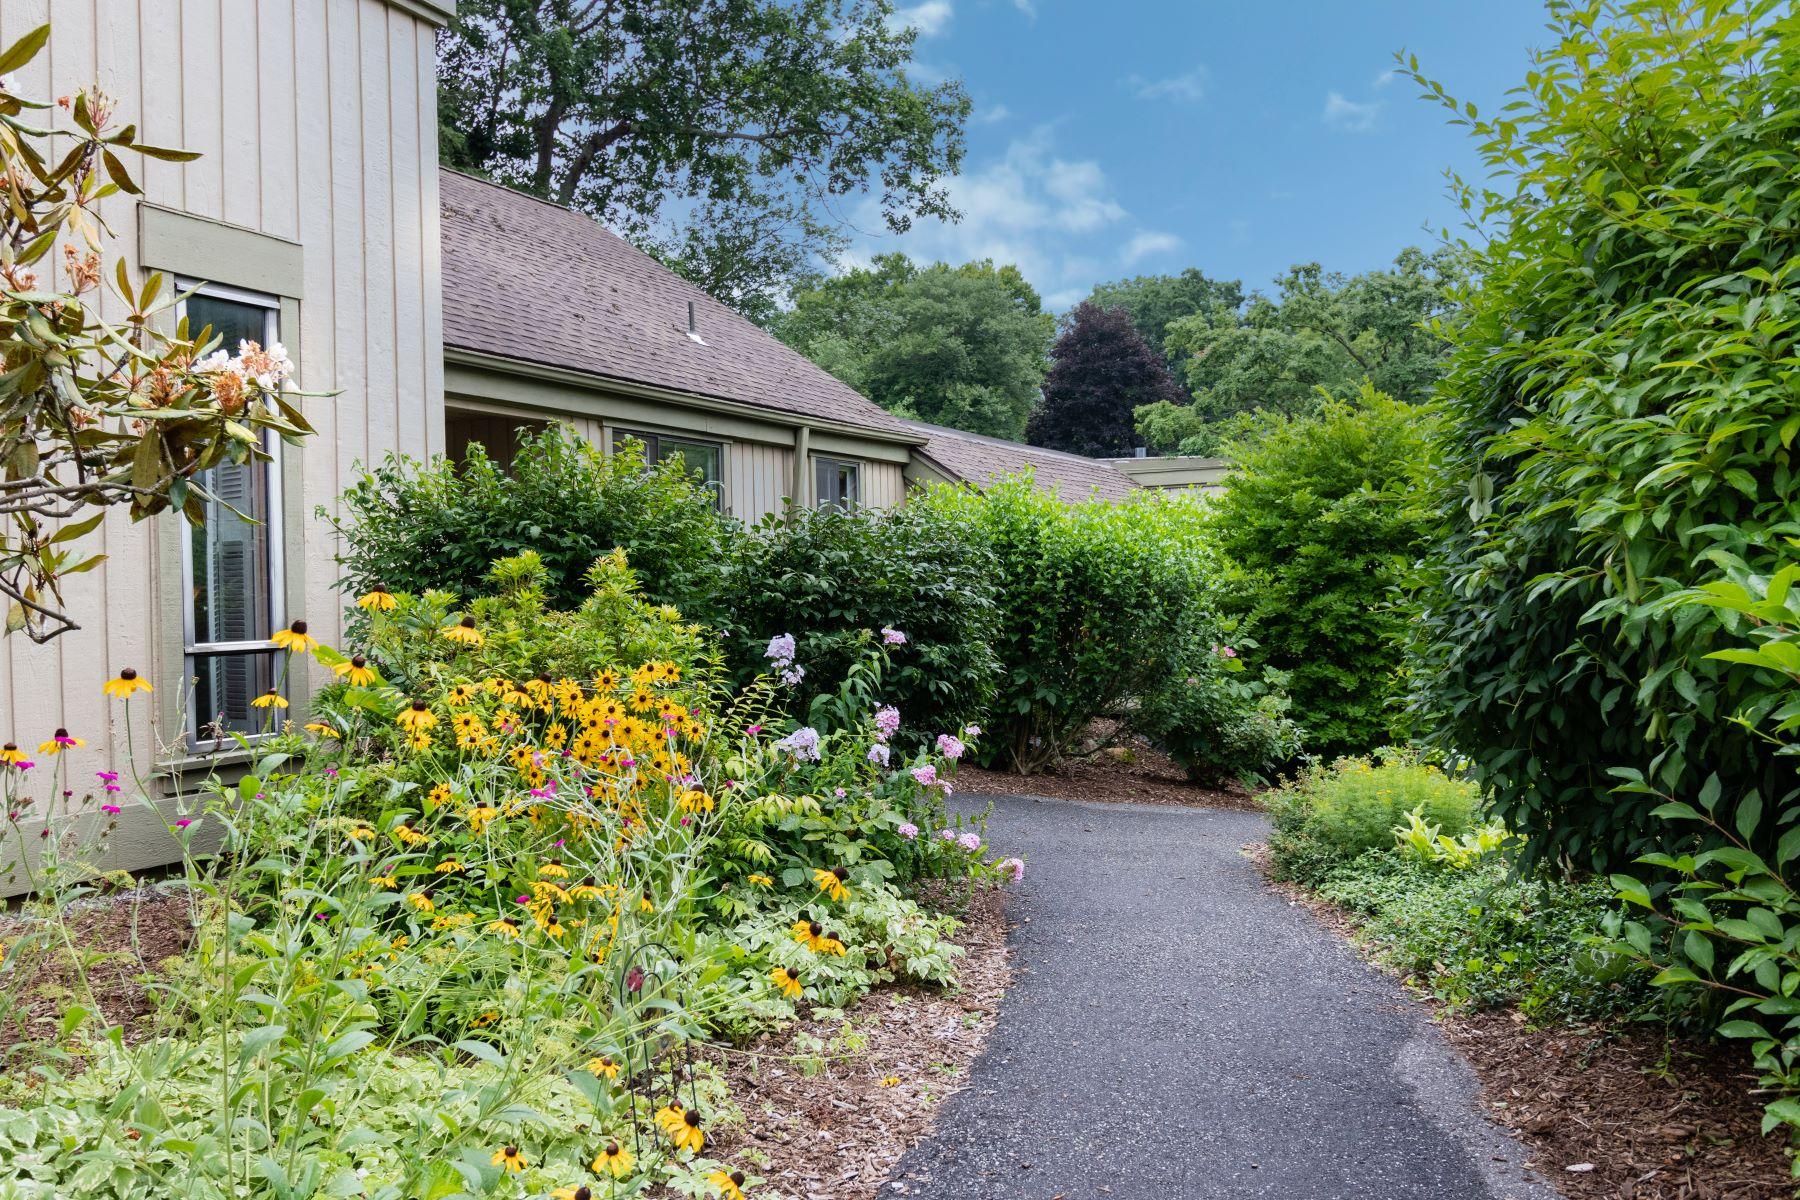 Condominiums للـ Sale في Clean, Convenient and Captivating 305 Heritage Village, A, Southbury, Connecticut 06488 United States